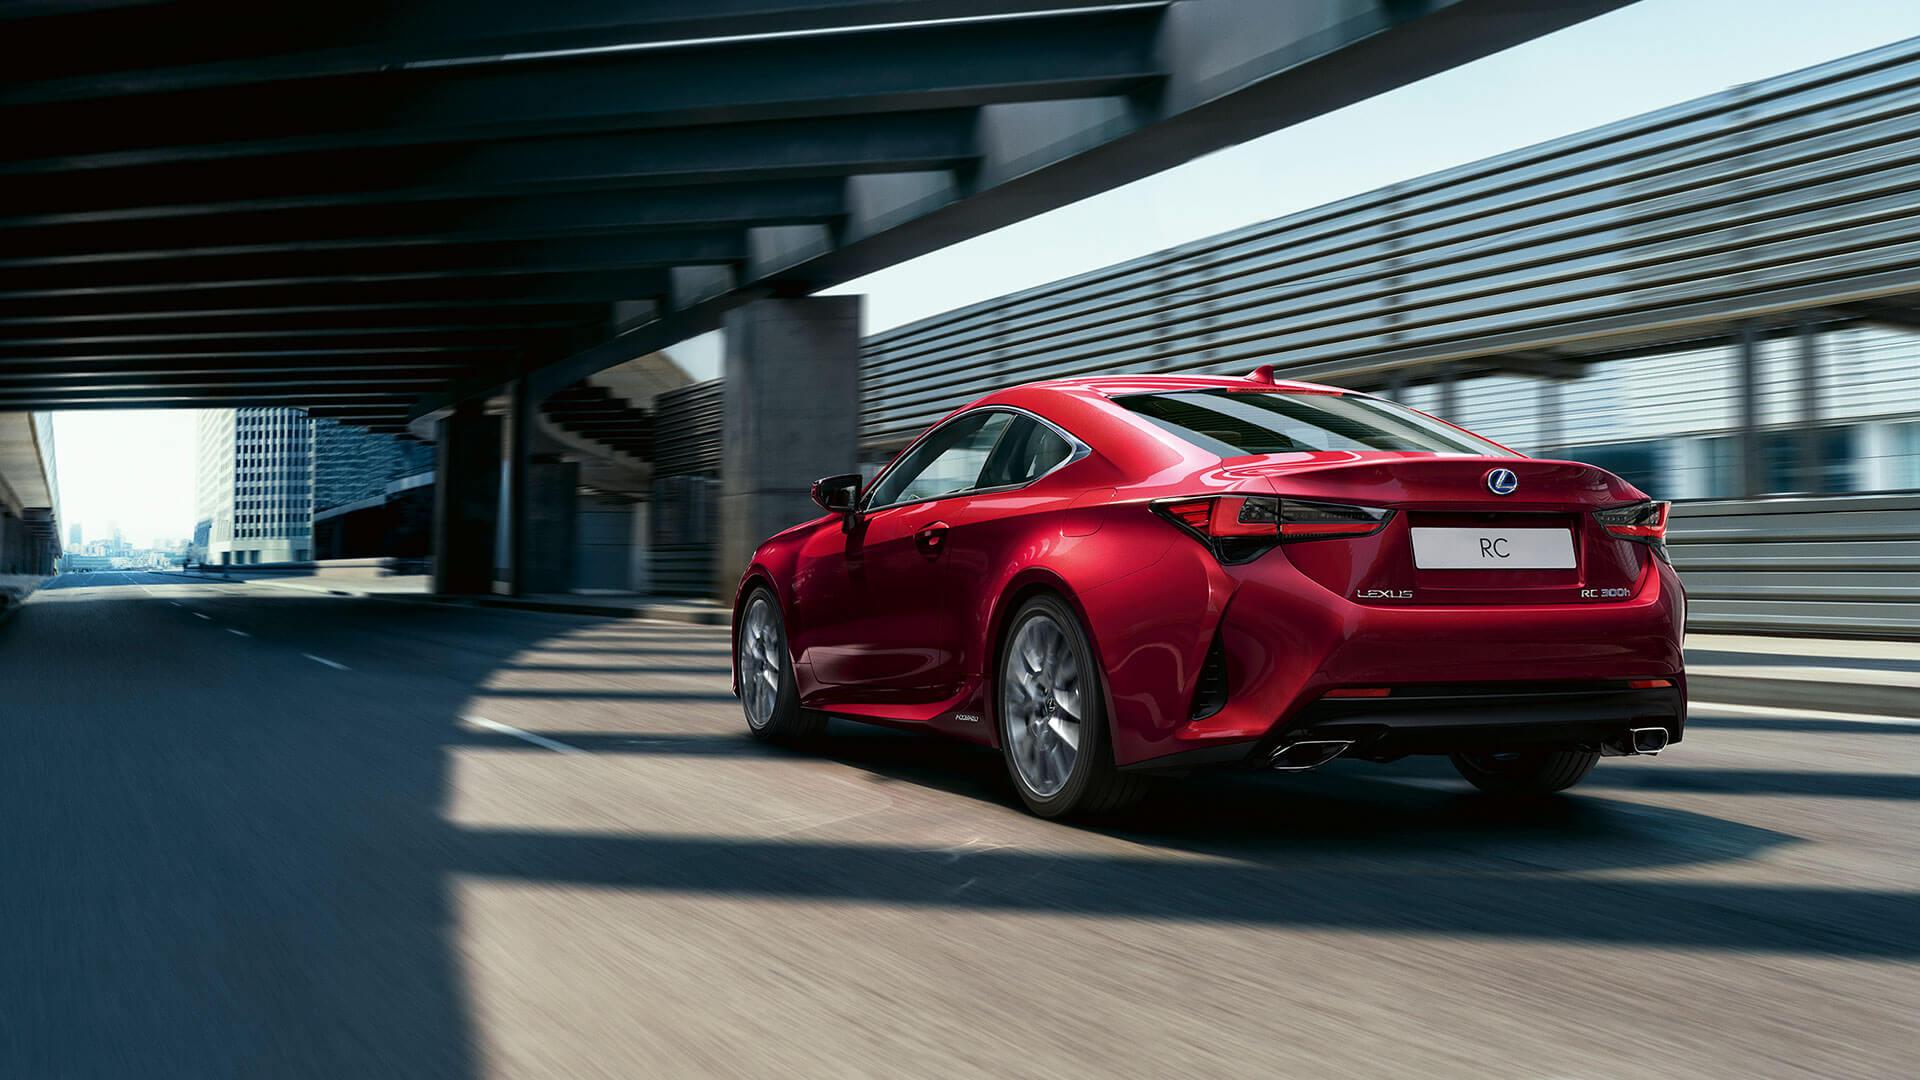 Lexus RC rot hinten